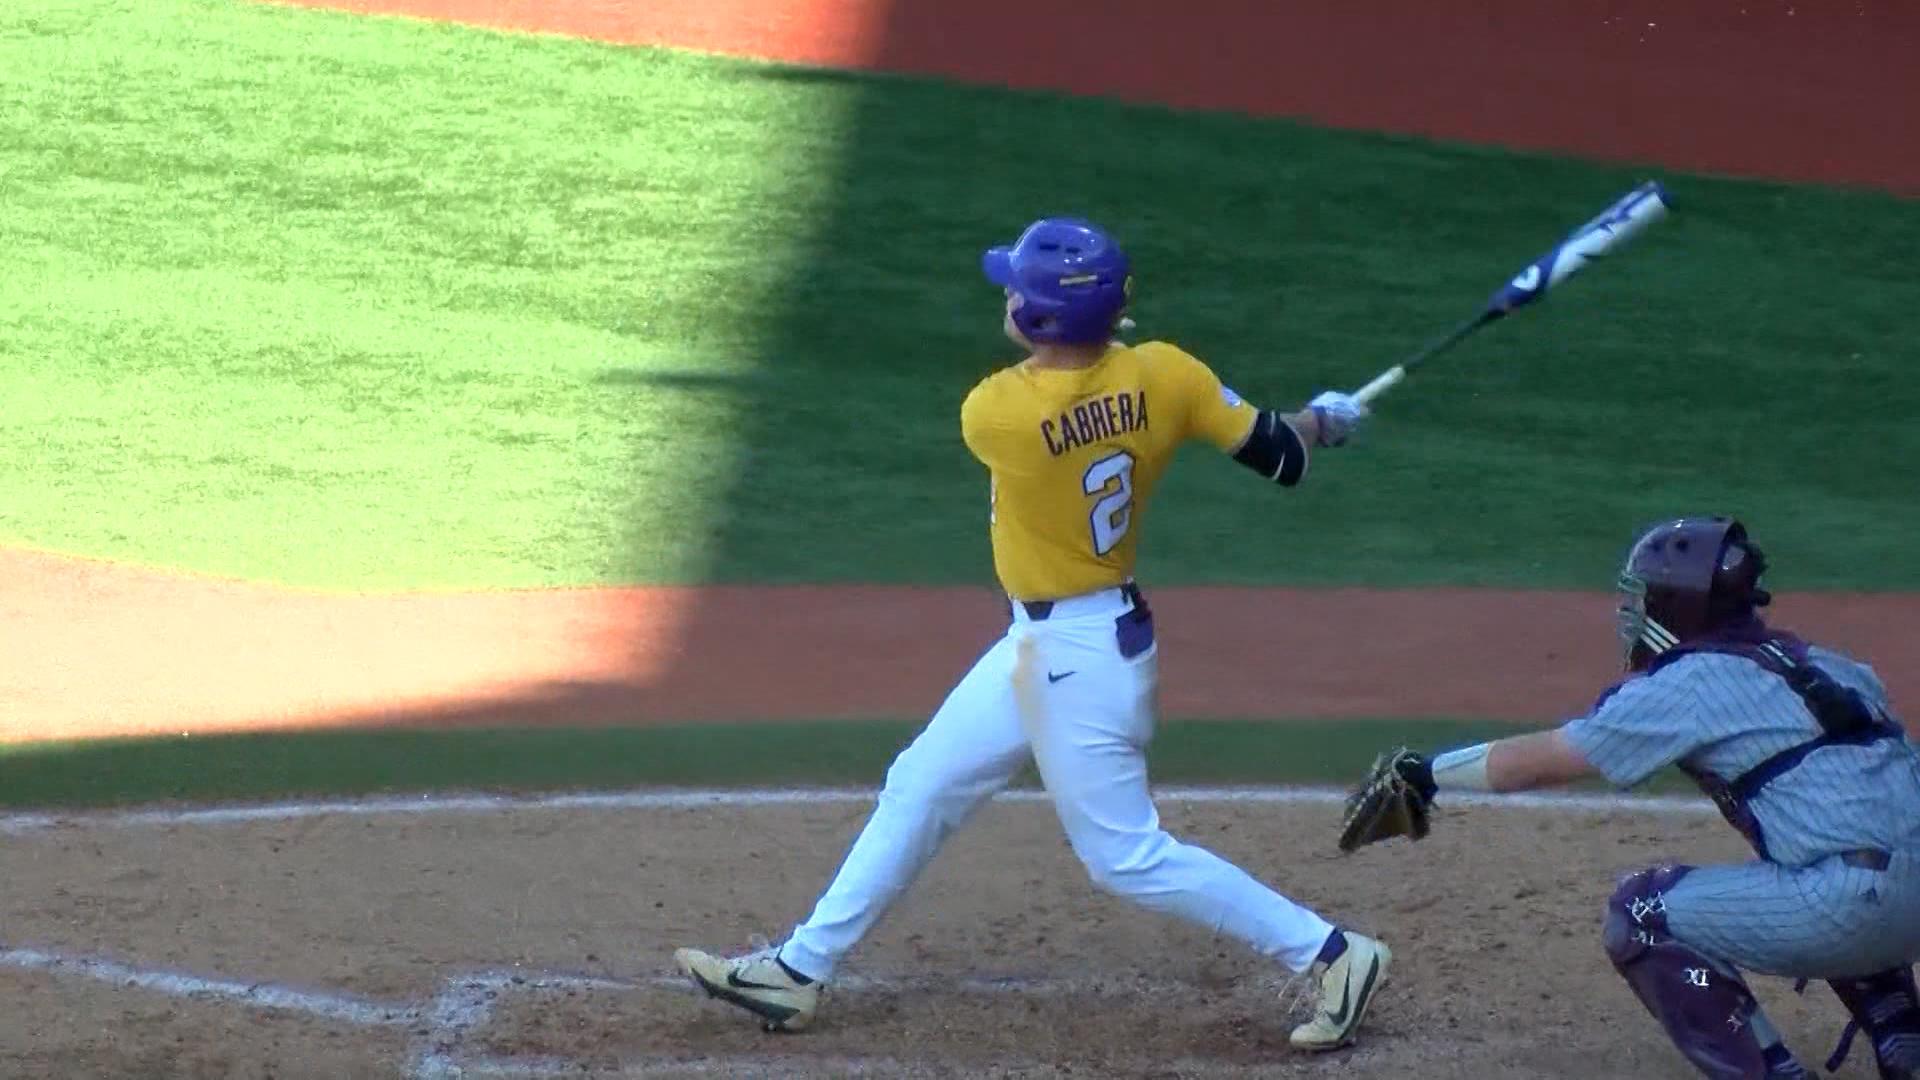 Daniel Cabrera Earns Baseball Jersey No. 8 | BRProud.com | WVLA | WGMB